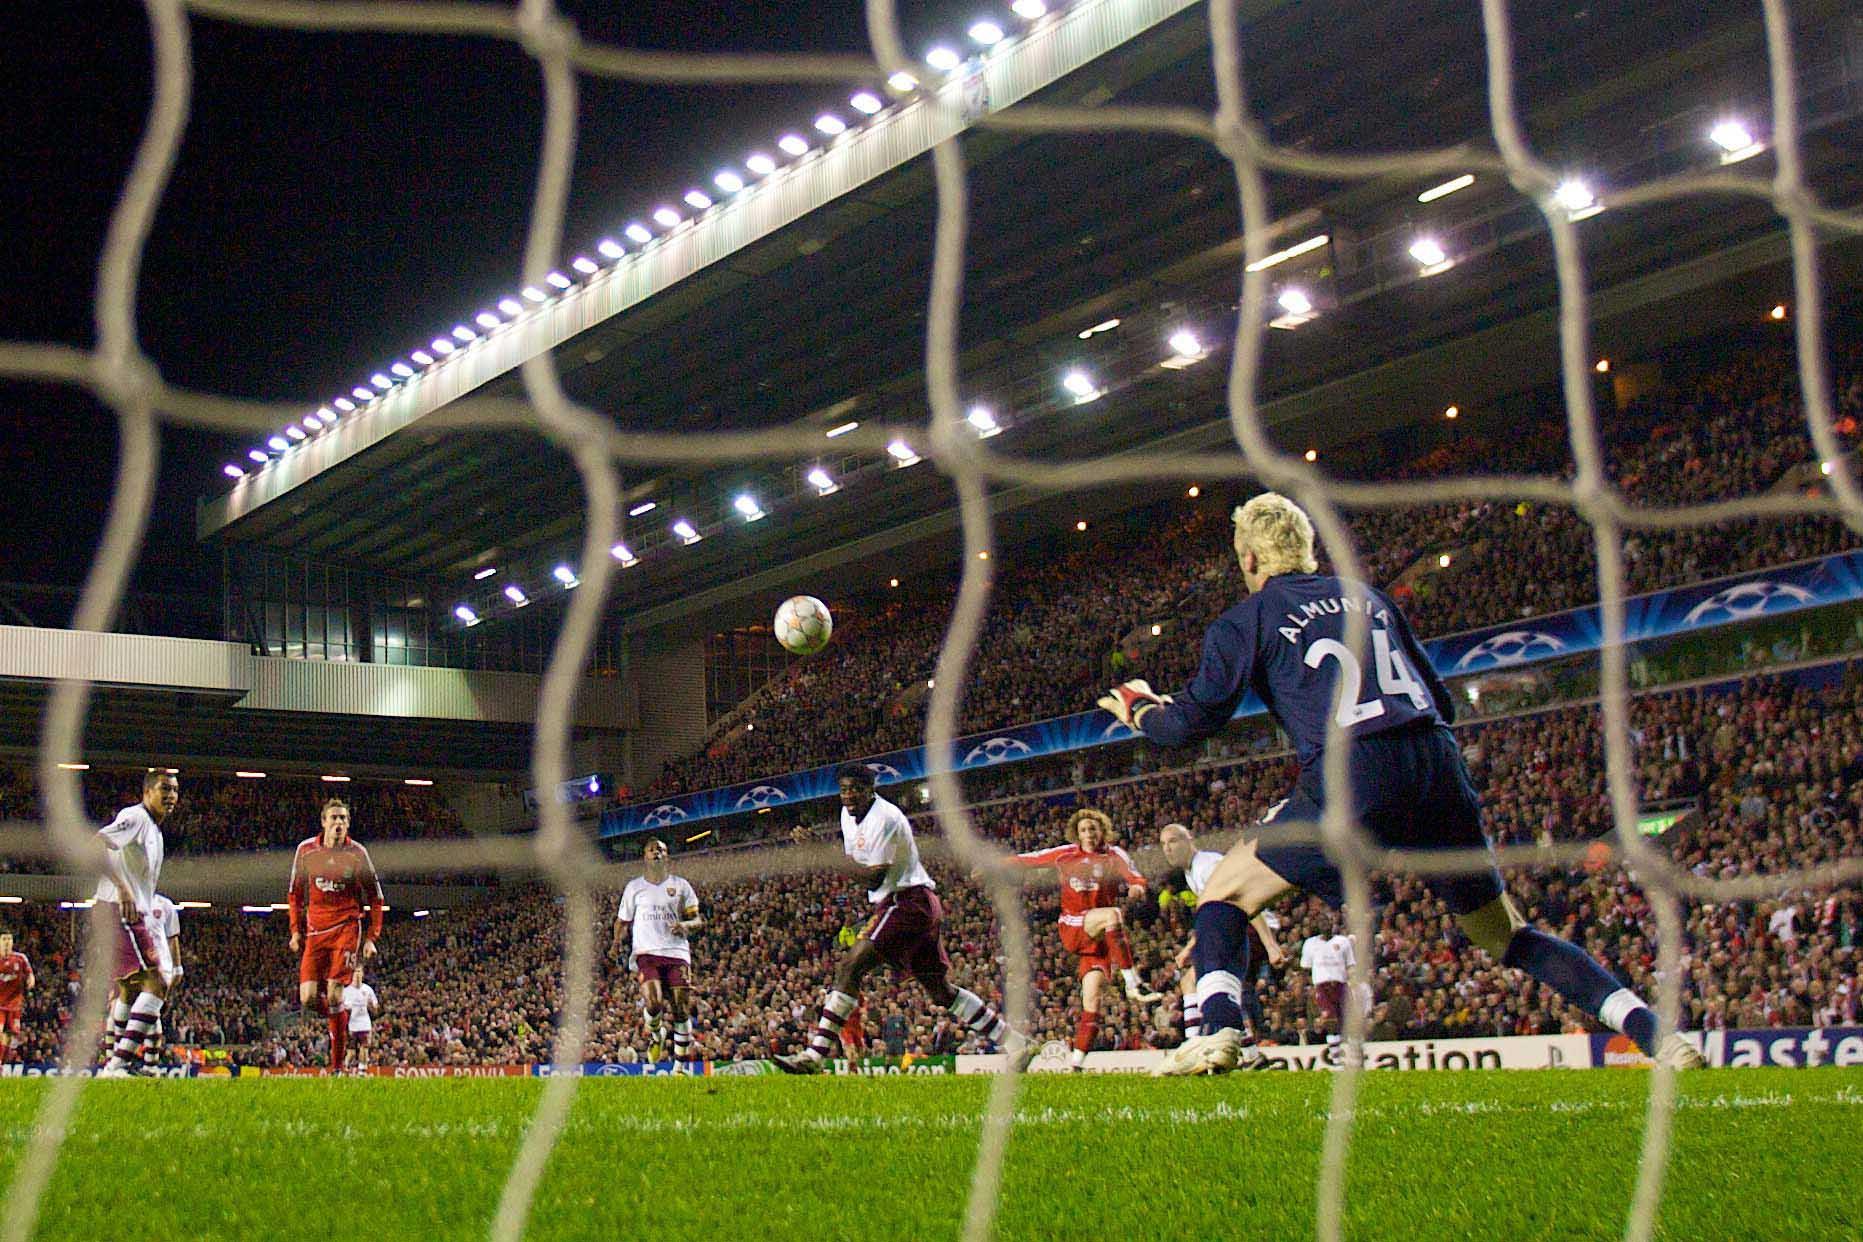 European Football - UEFA Champions League - Quarter-Final - 2nd Leg - Liverpool FC v Arsenal FC